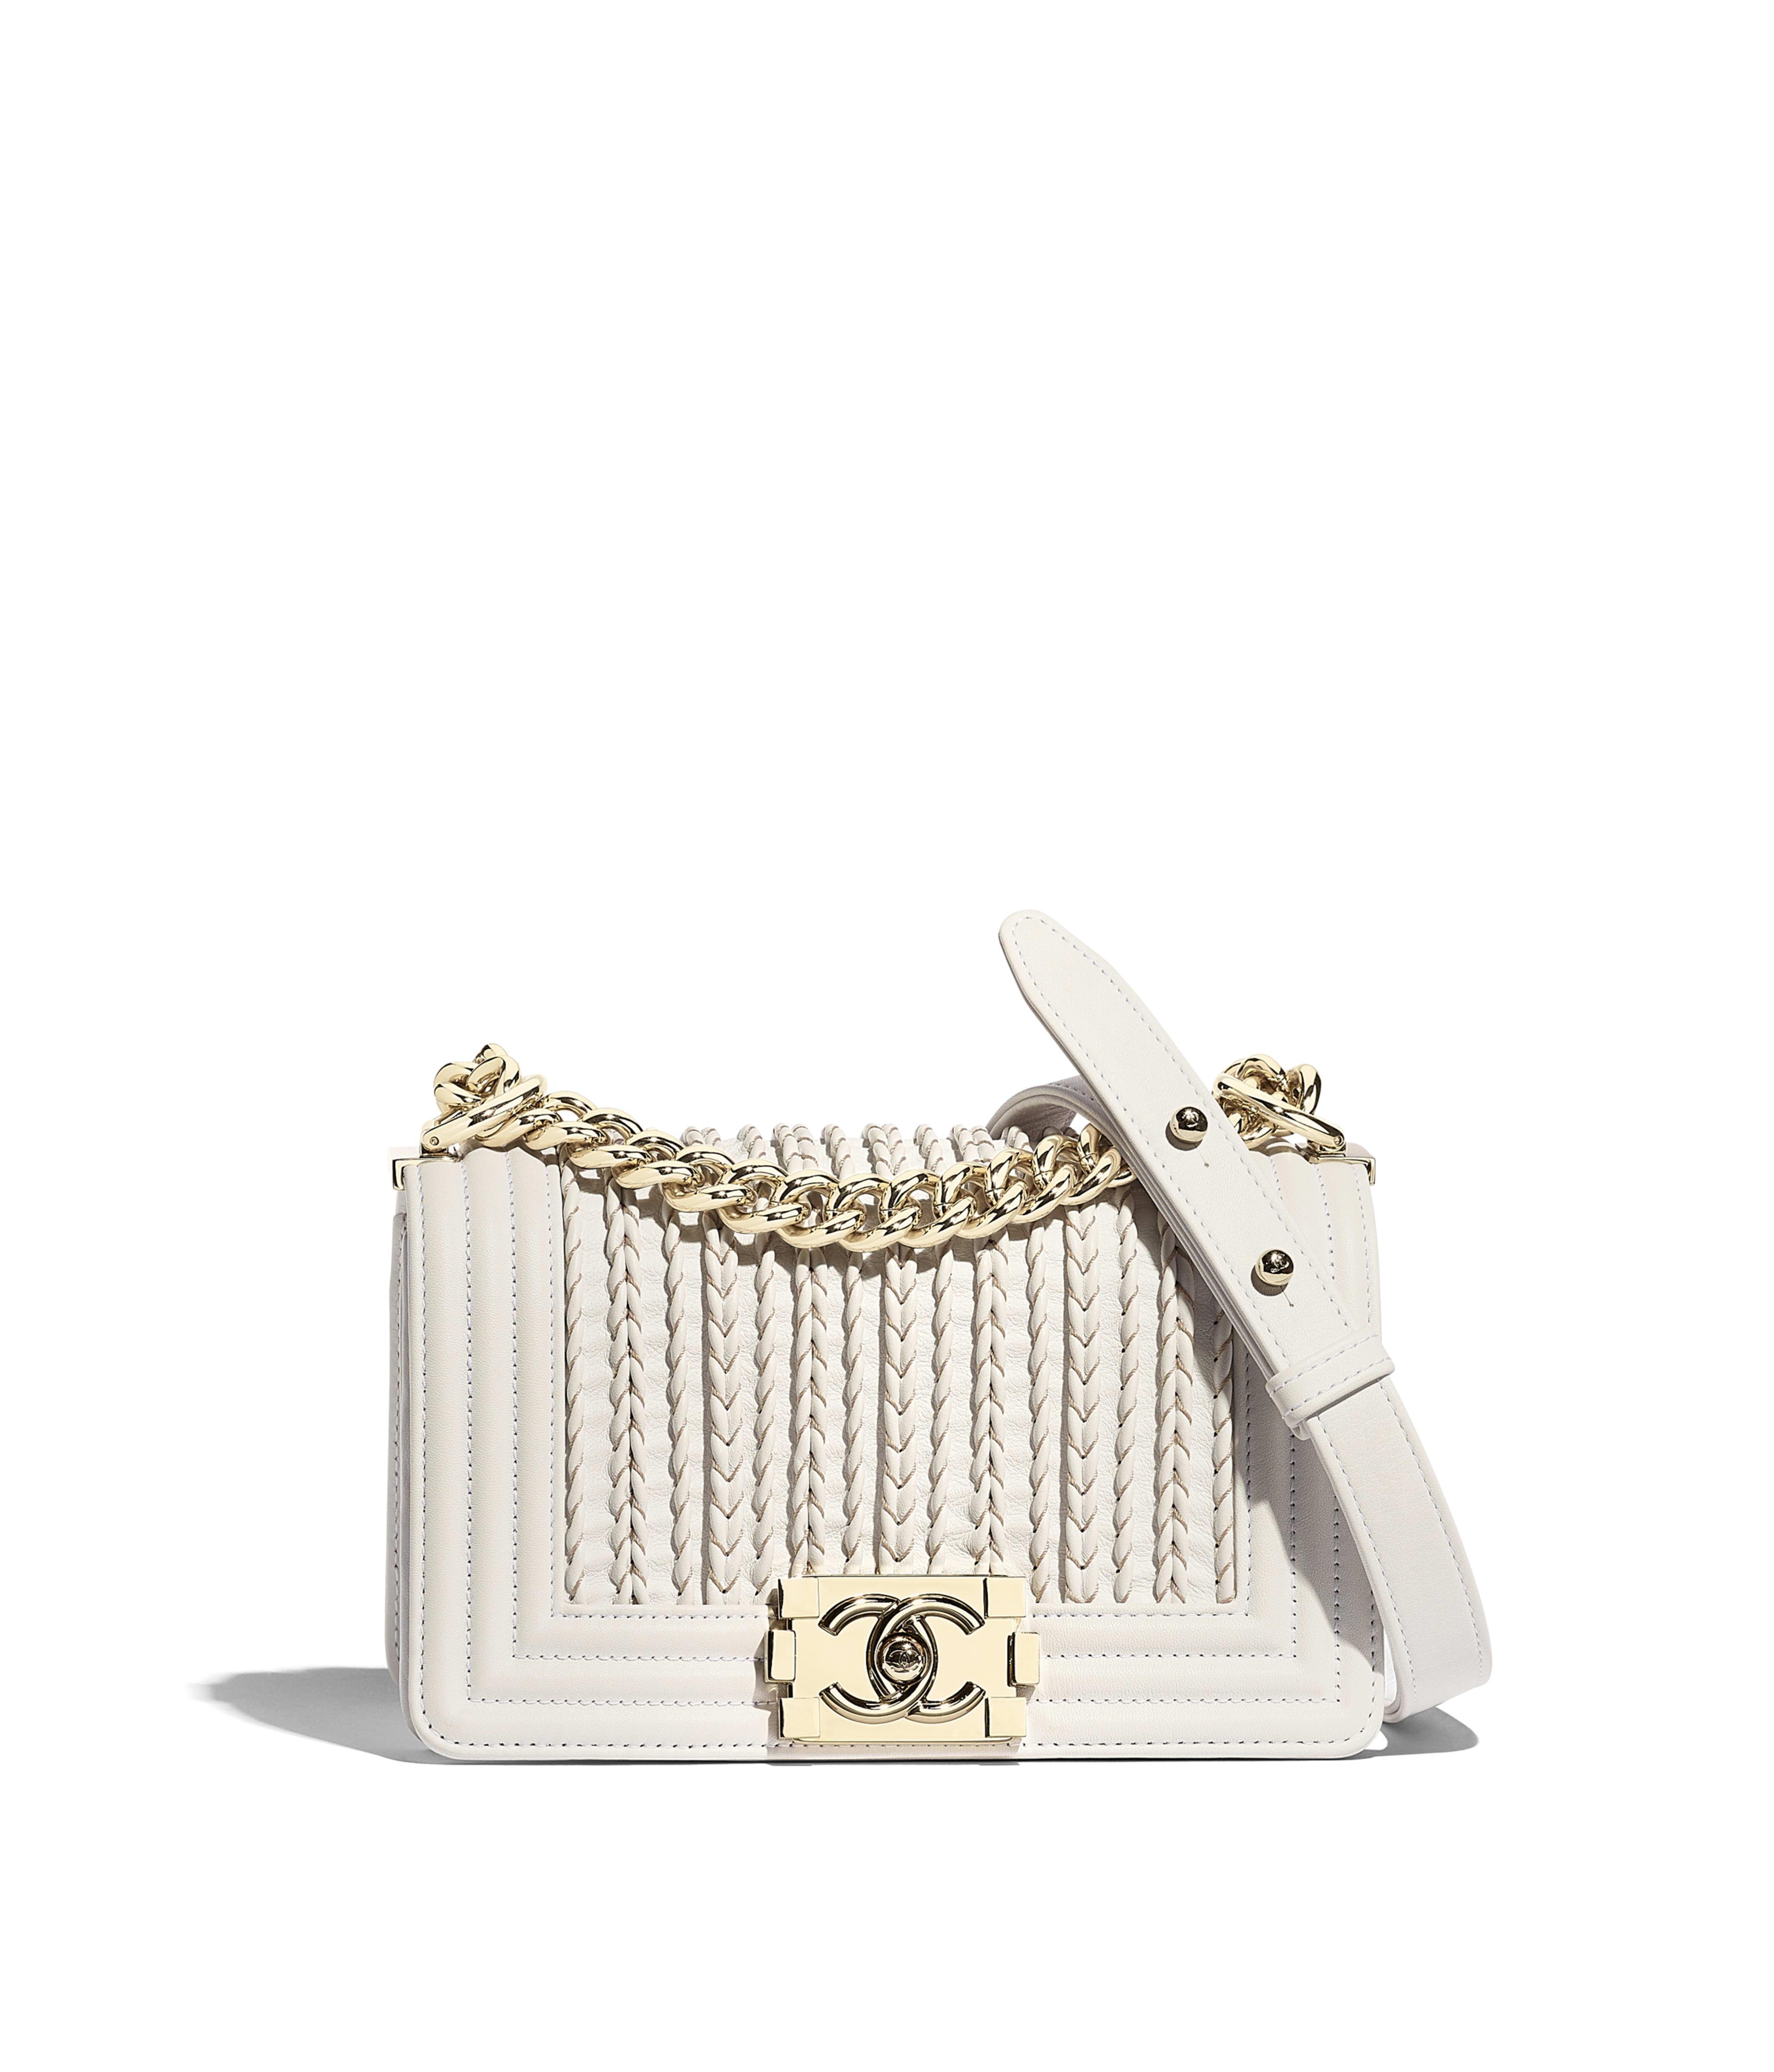 7bf9baa4da53 Small BOY CHANEL Handbag Embroidered Calfskin, Smooth Calfskin & Gold-Tone  Metal, White Ref. A67085B0003110601